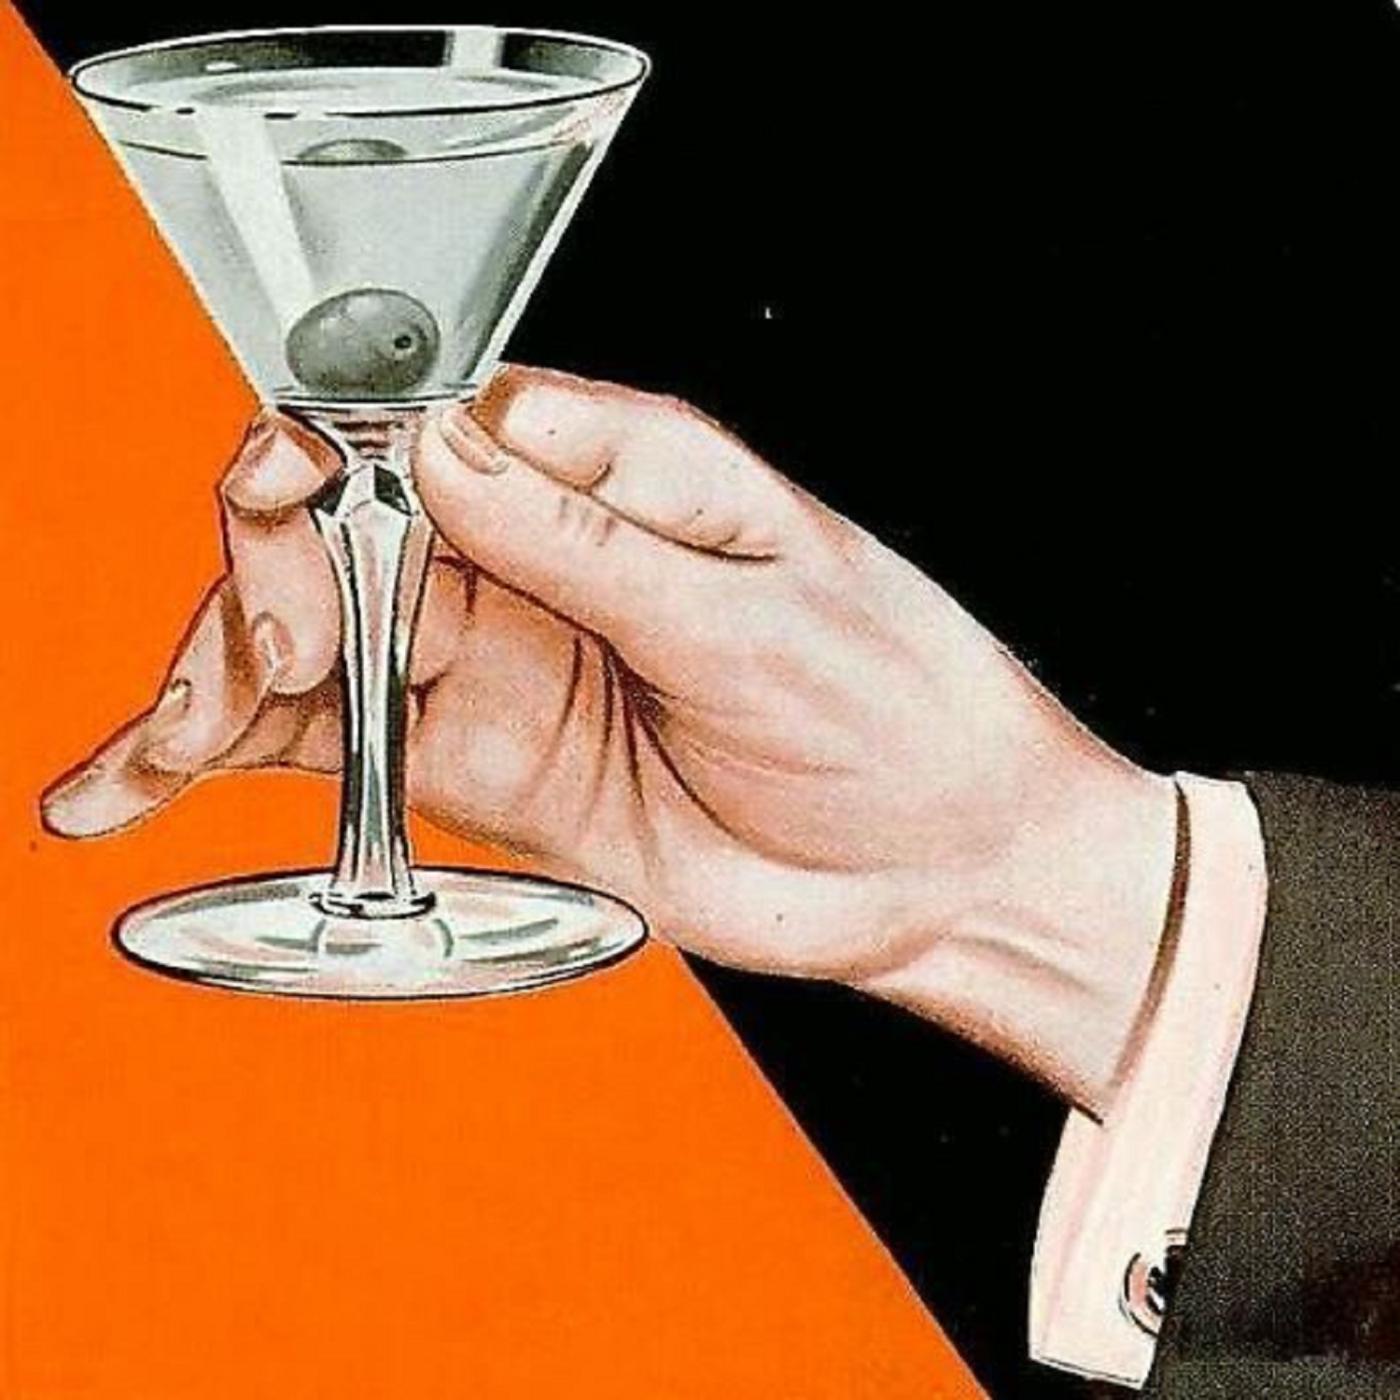 週末的Martini